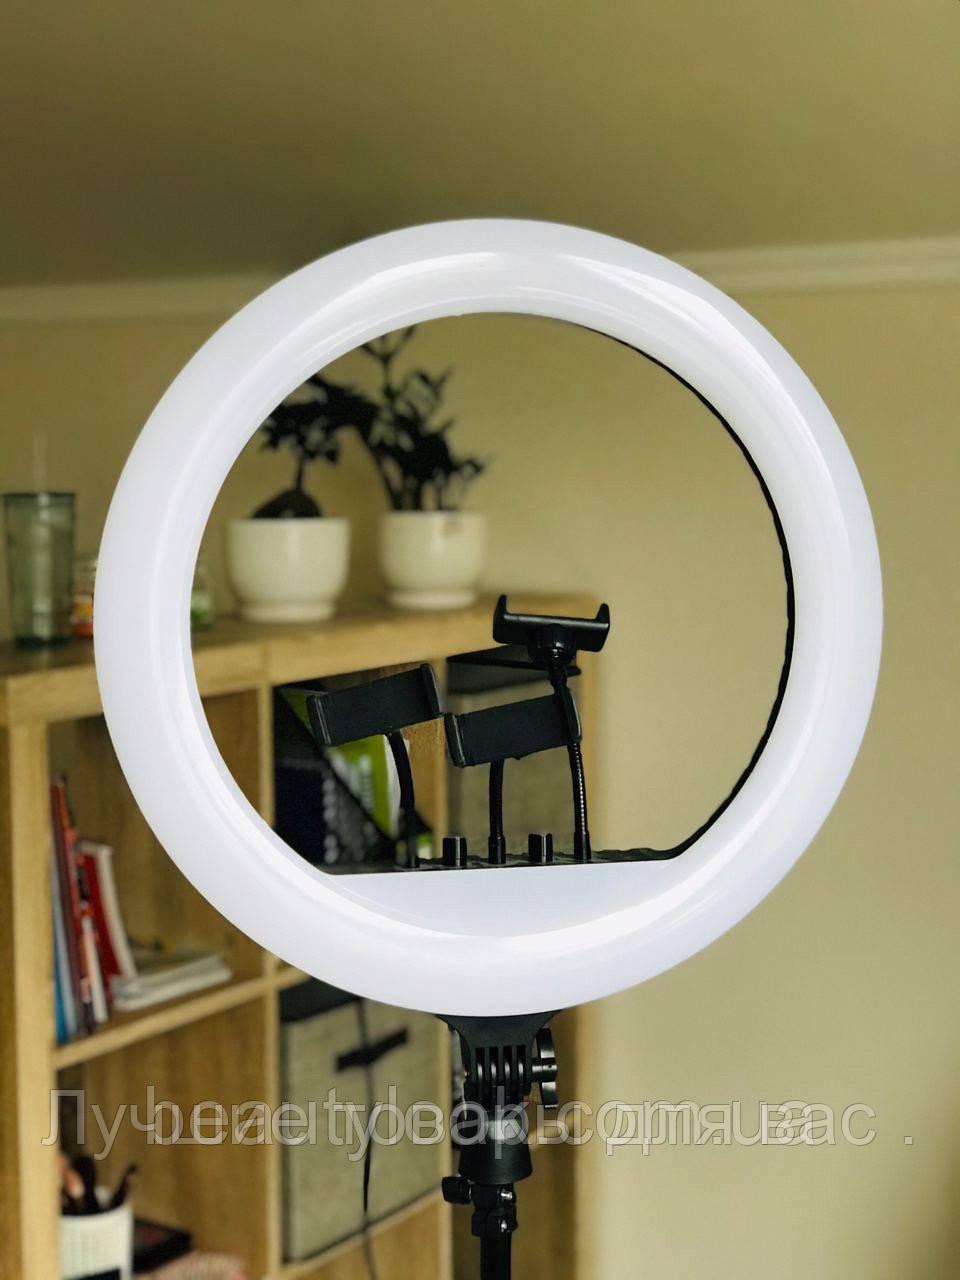 Кольцевая лампа 45 см. D18 с раздвижным штативом штативом 2,1 м.